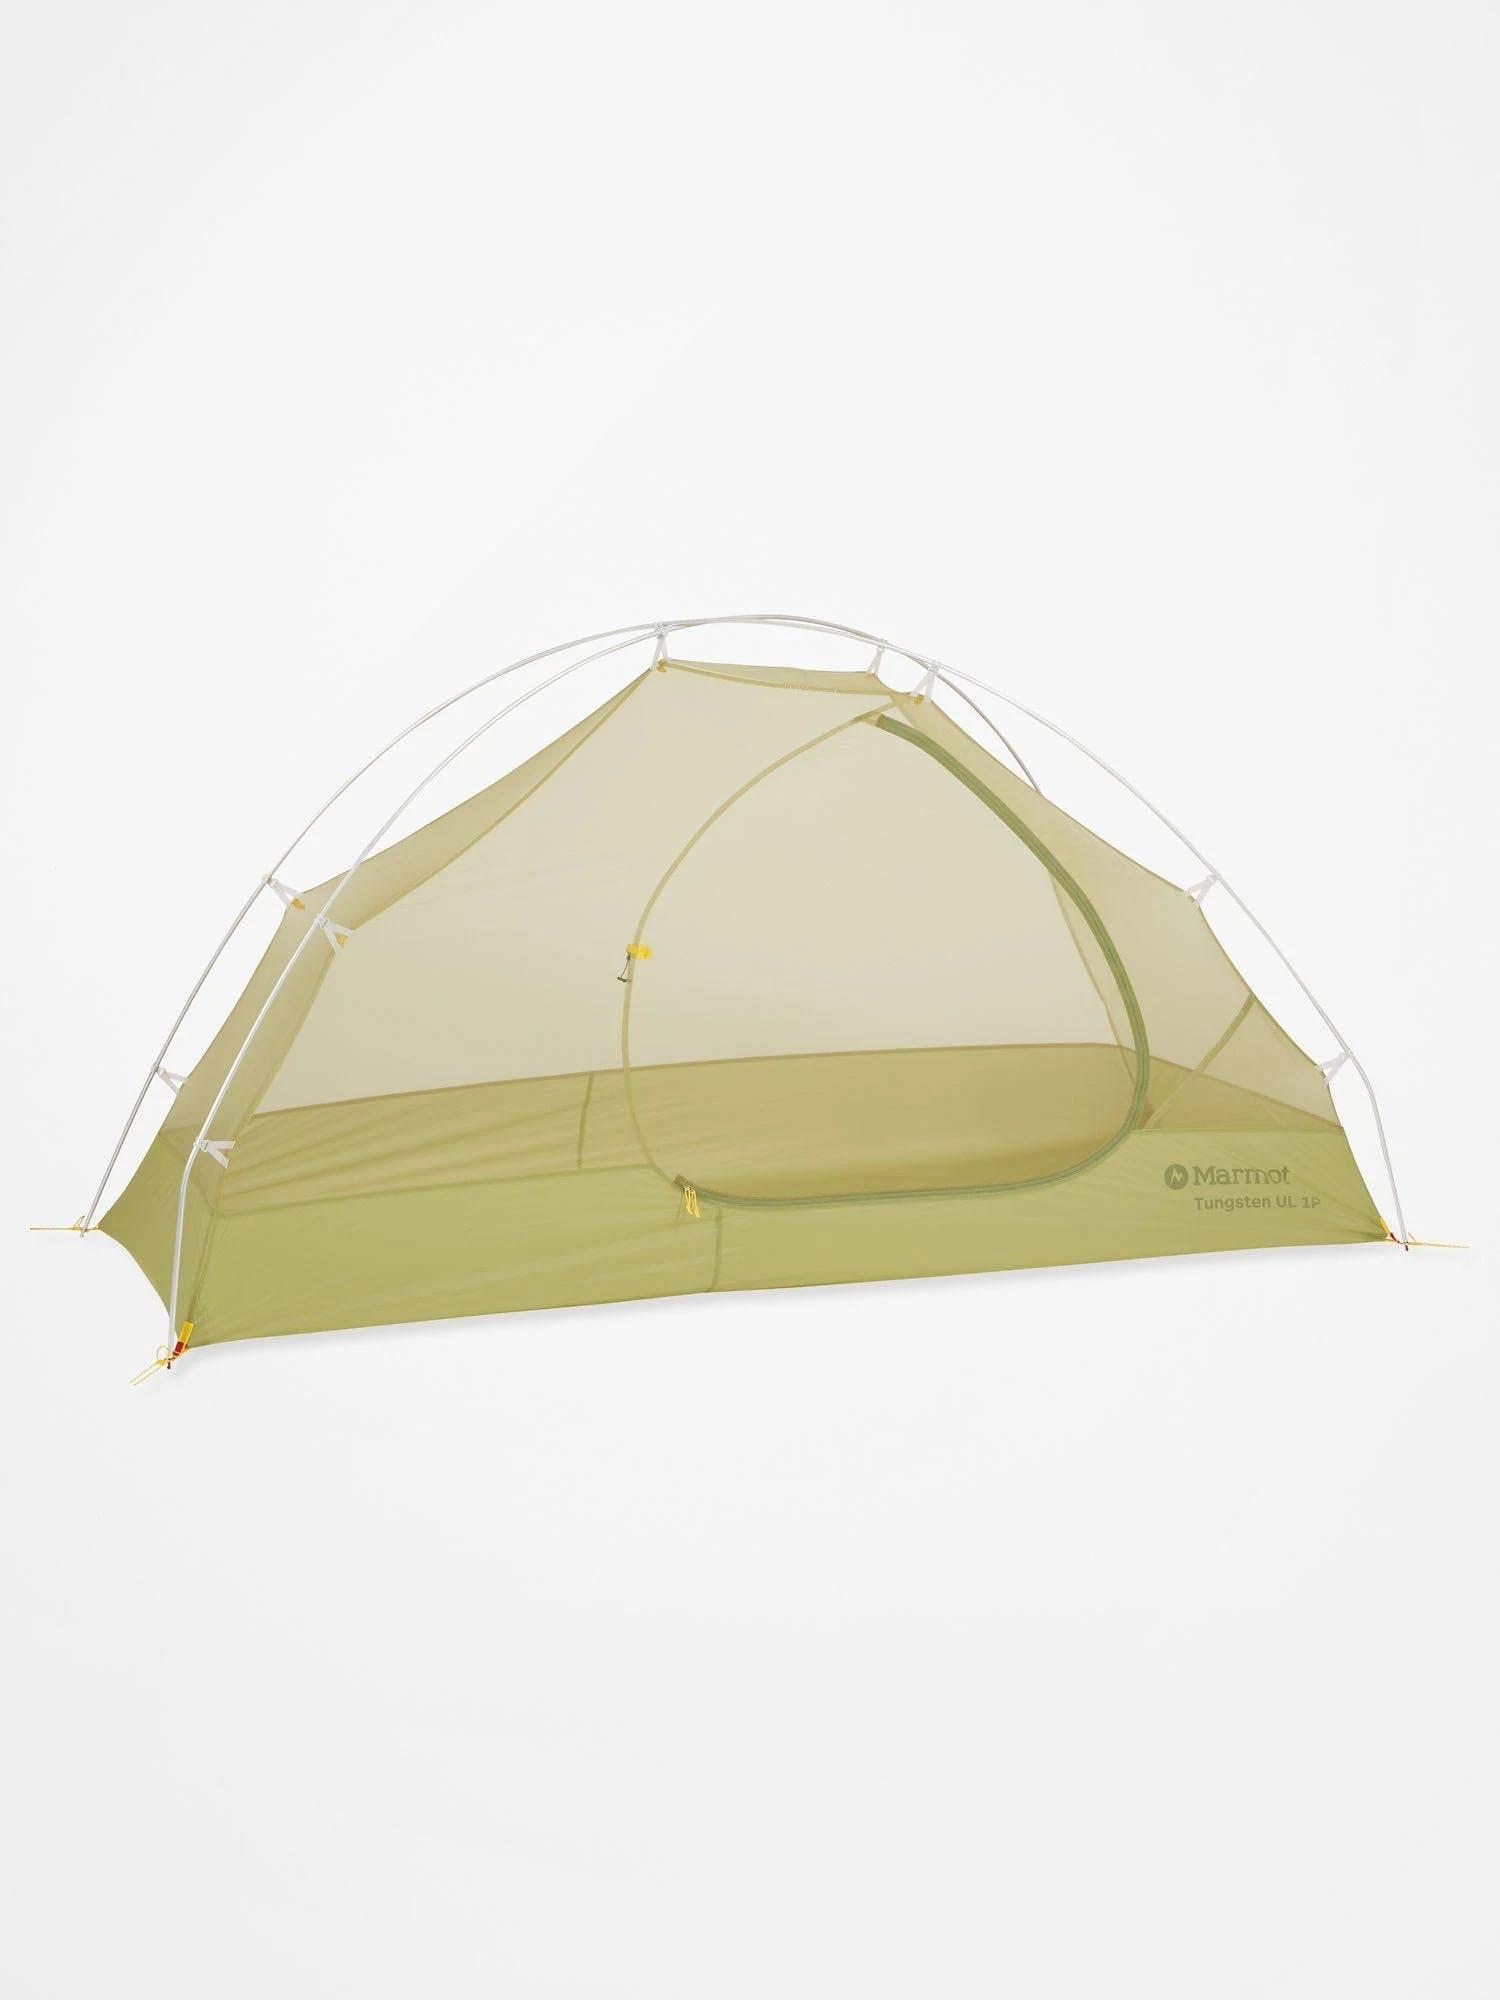 Marmot Tungsten UL 1P Tent - 1 Person / Wasabi